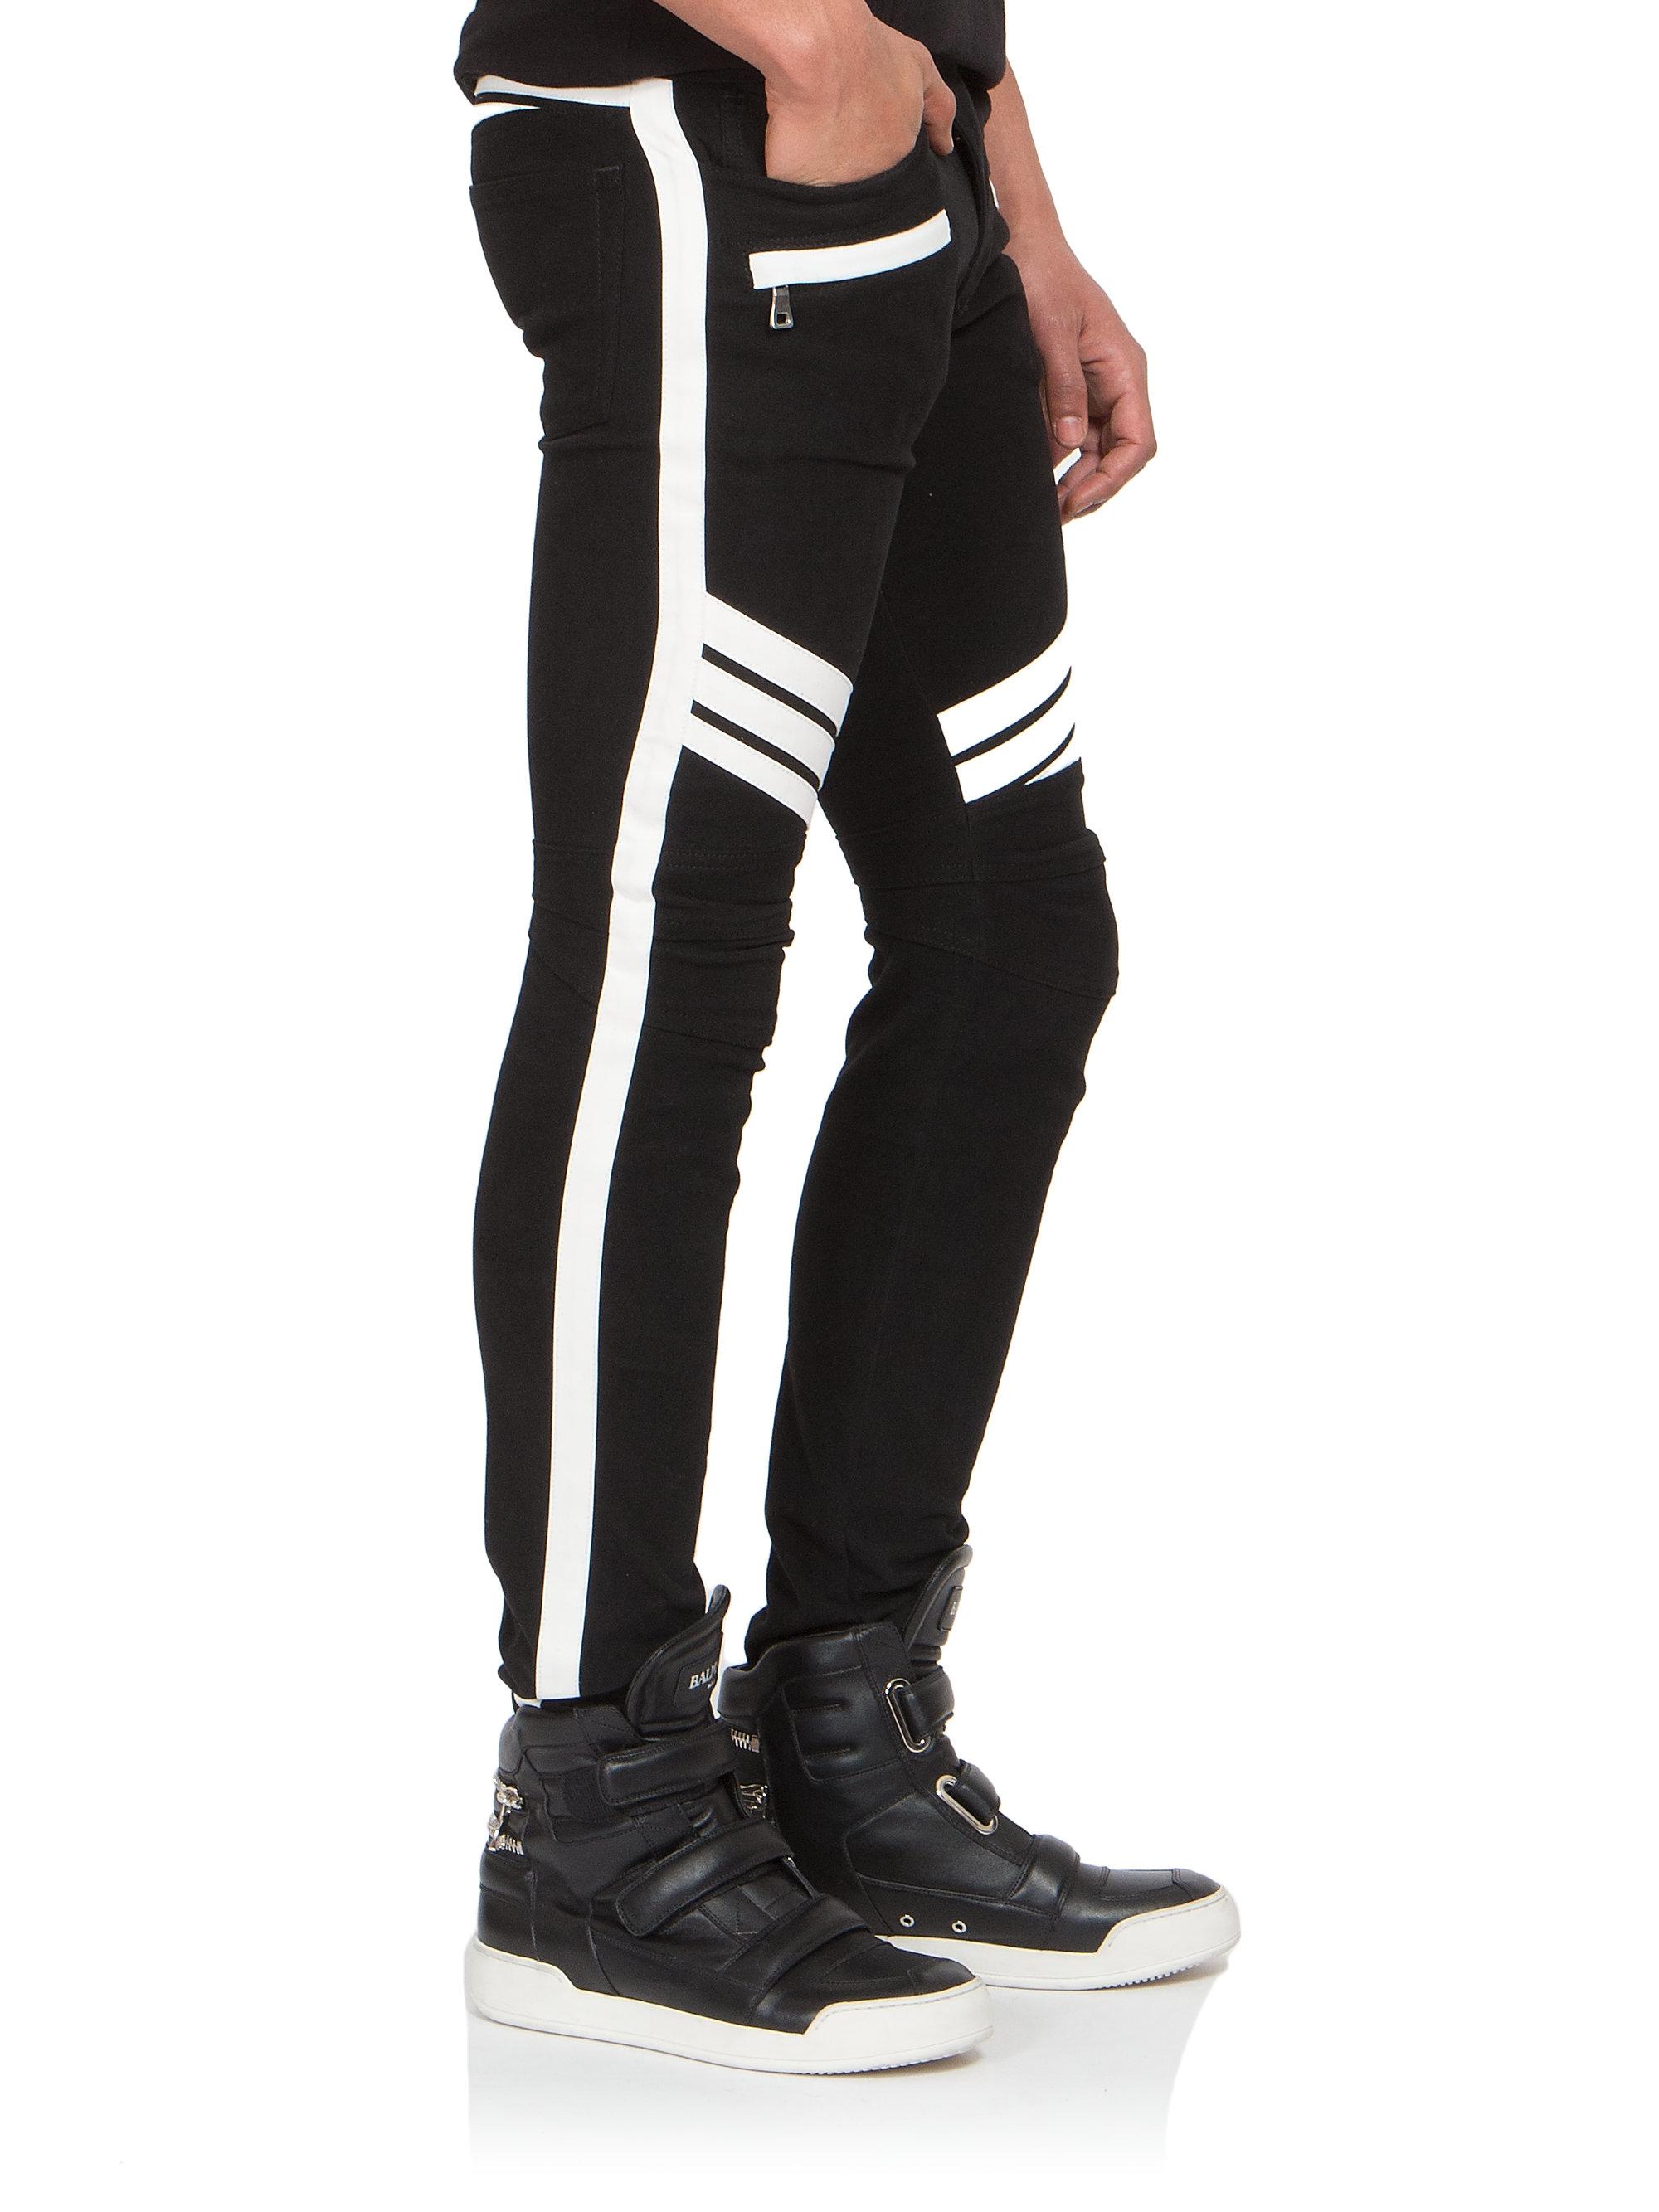 3e9d11ea5b Balmain Racing Stripe Moto Slim Jeans in Black for Men - Lyst